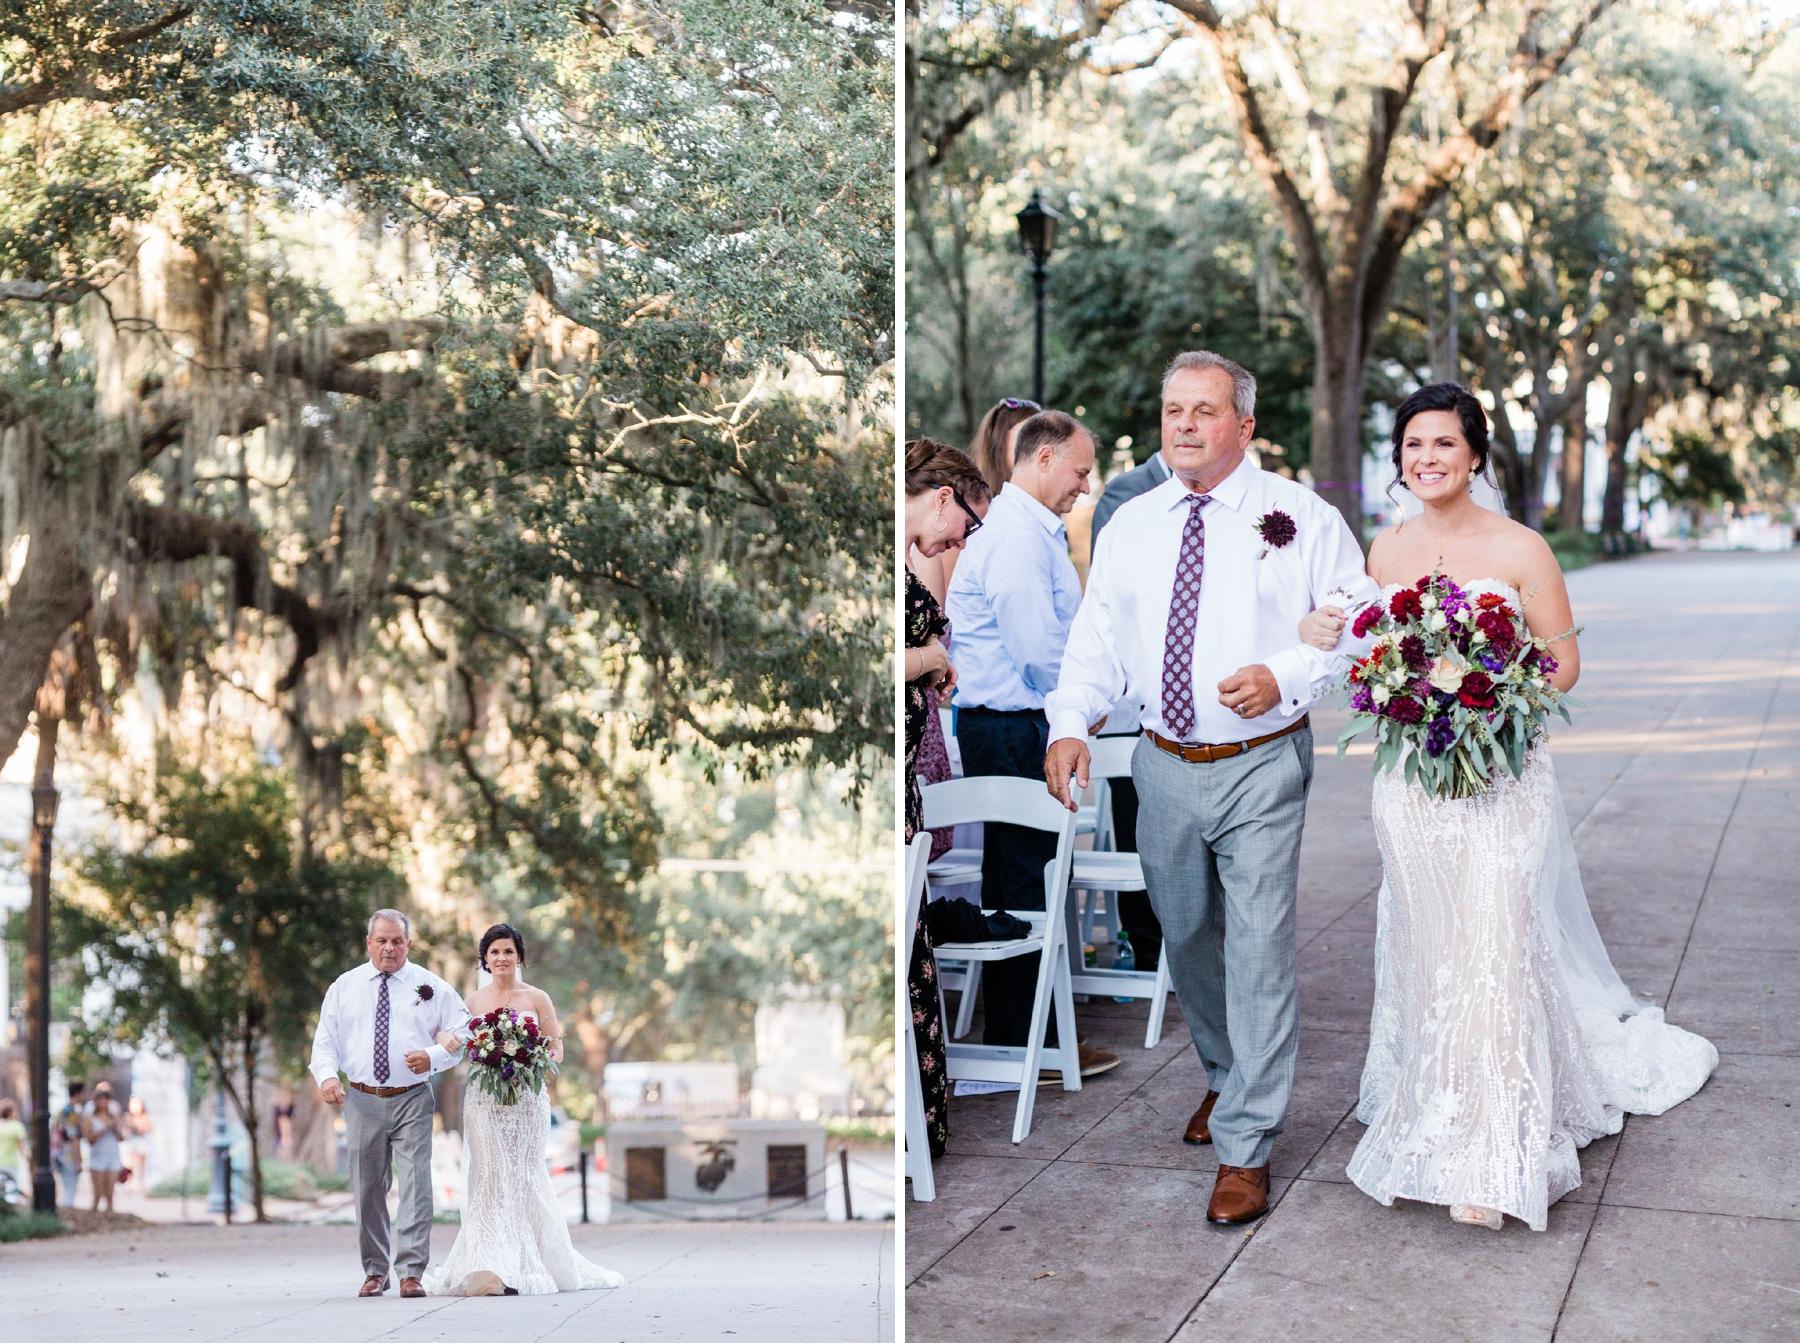 Danielle and Travis – Forsyth Park Wedding – Savannah Wedding Photographer | Apt. B Photography